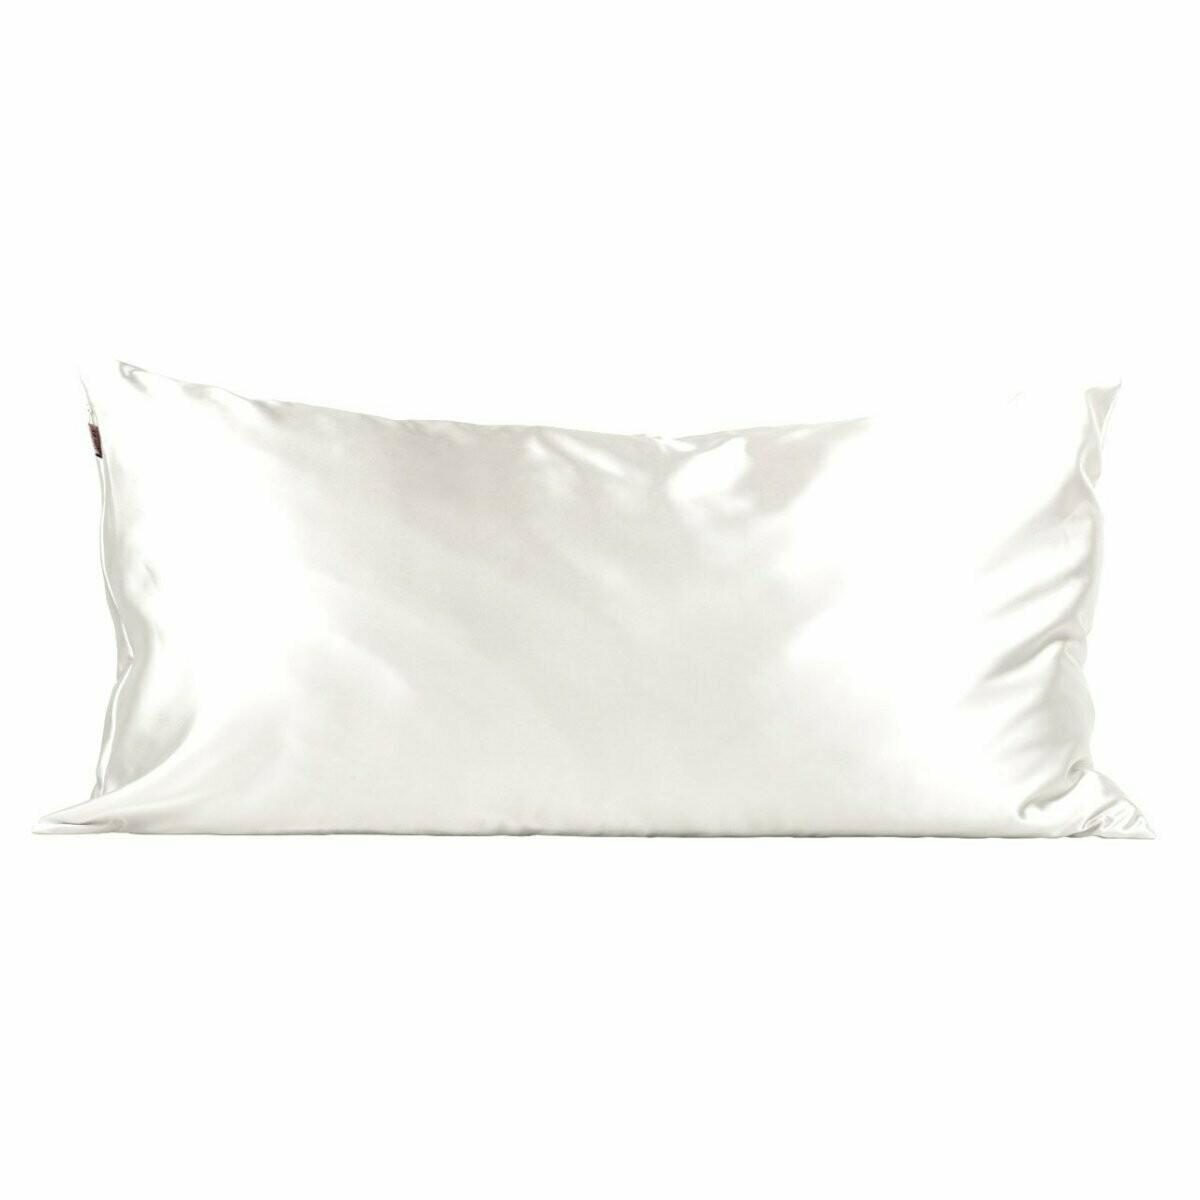 King Satin Pillow Case-Ivory